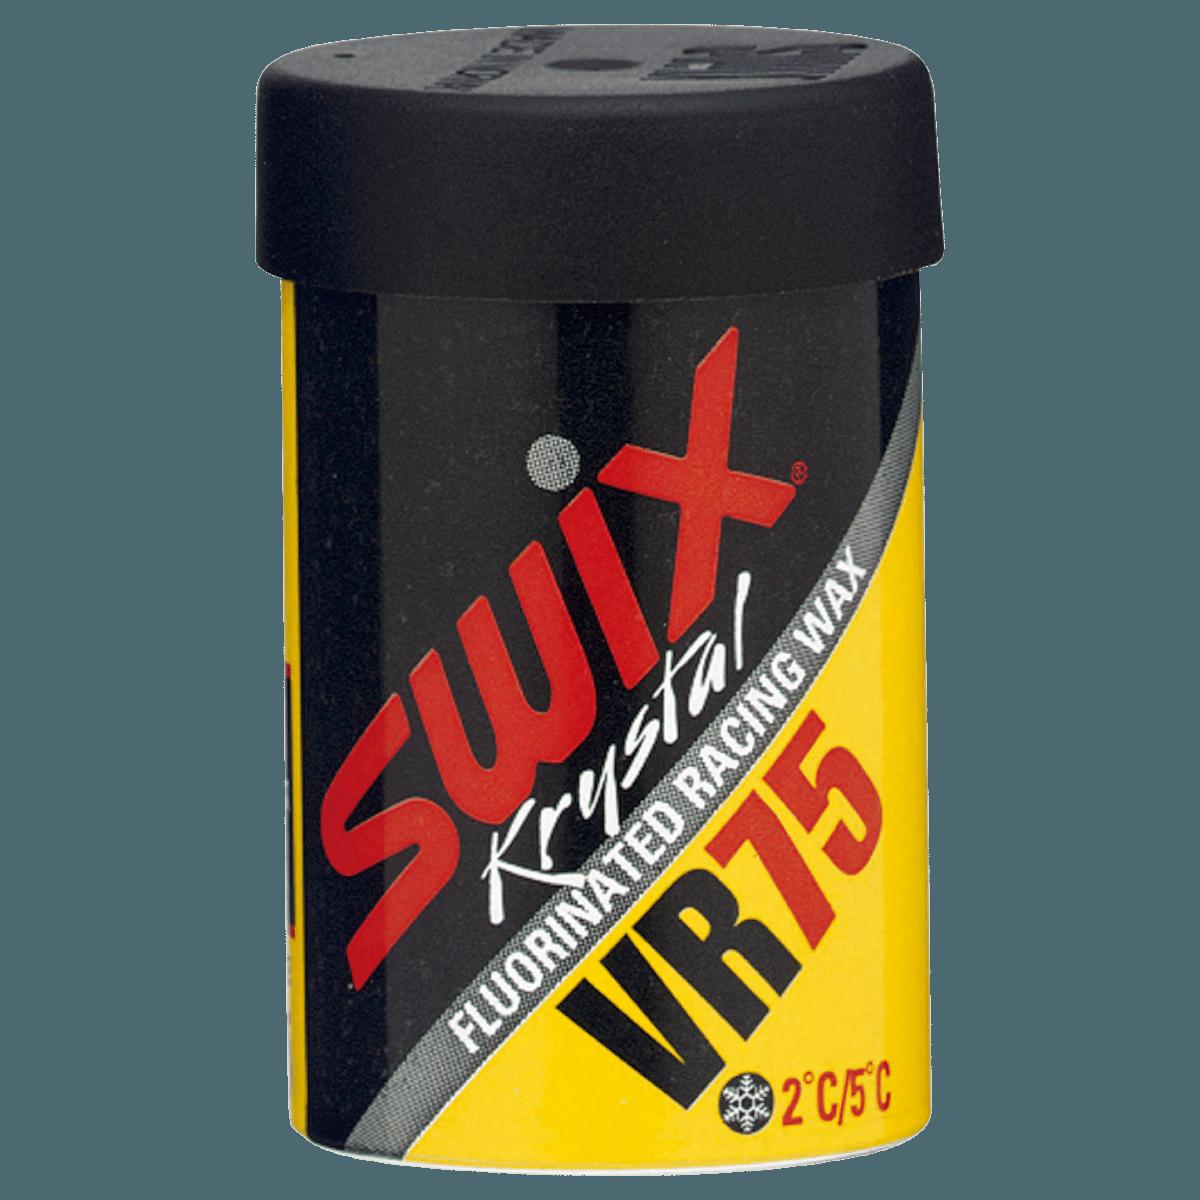 Swix tørrvoks VR075 Myk klistervoks - gul